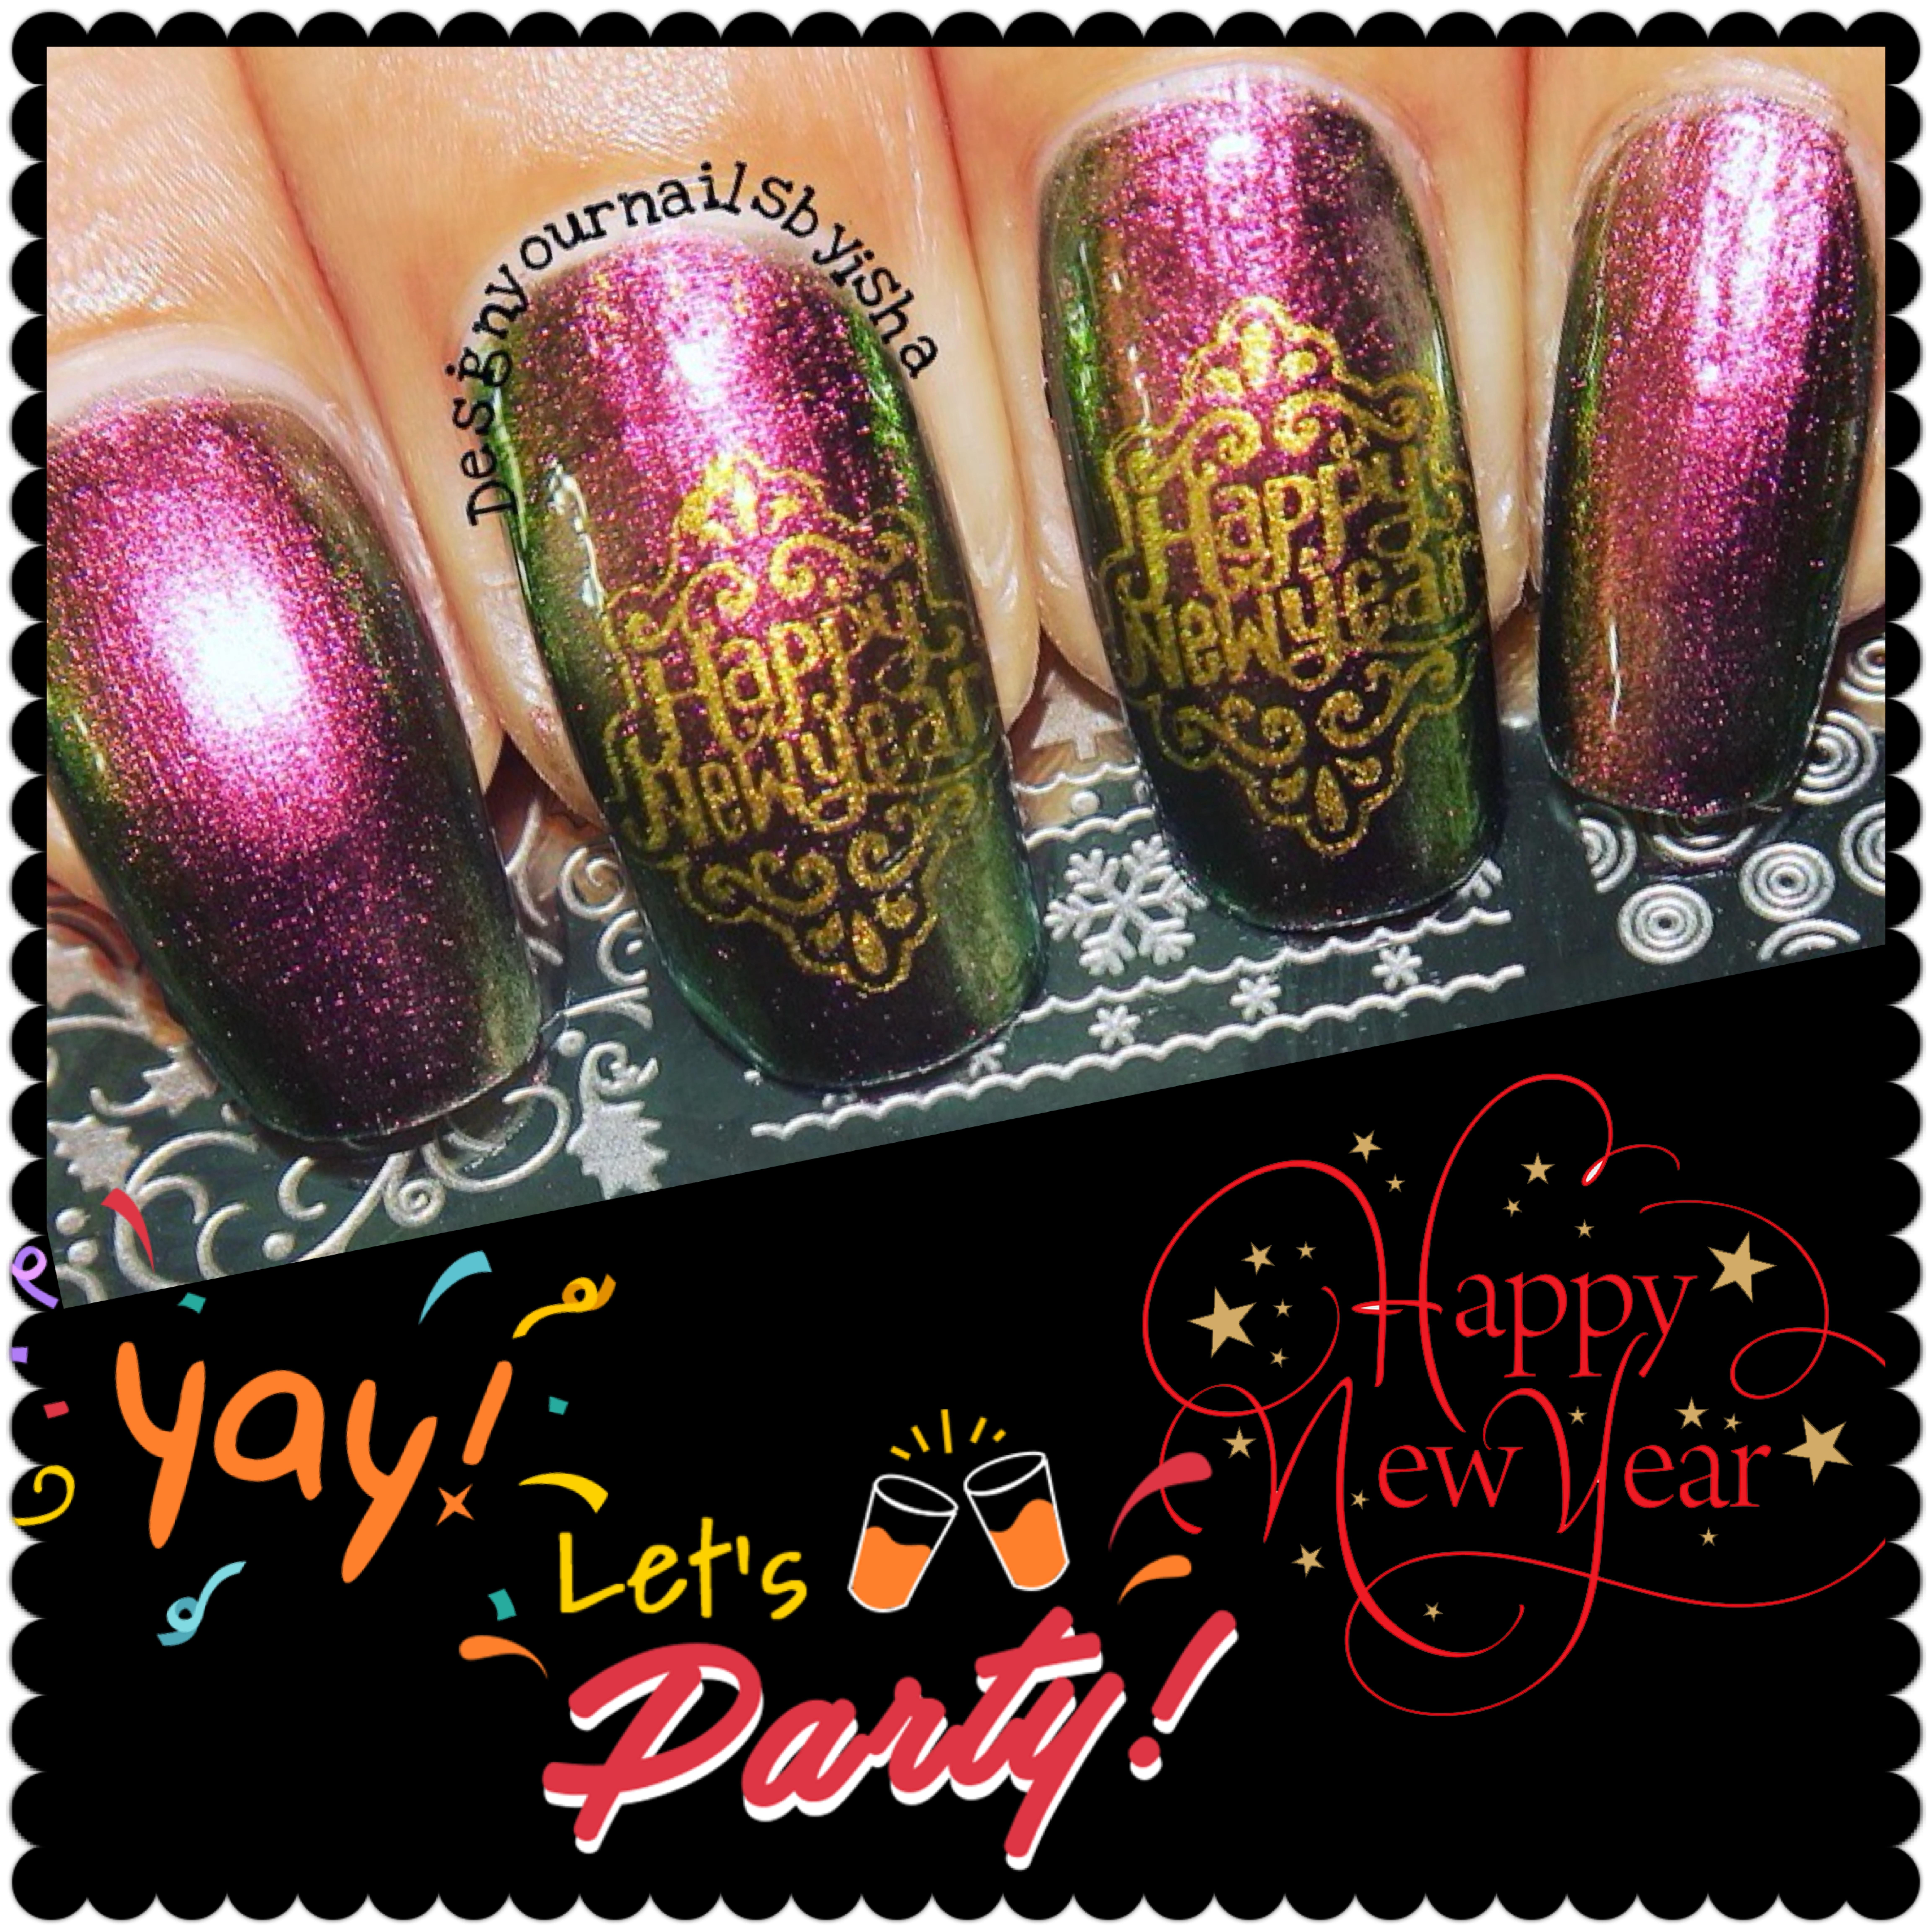 #happynewyear #newyear2018 #welcome2018 #roposo #soropos #roposowishes #thanksroposo #designyournailsbyisha #newyearwishes #fun #happy #enjoy #party